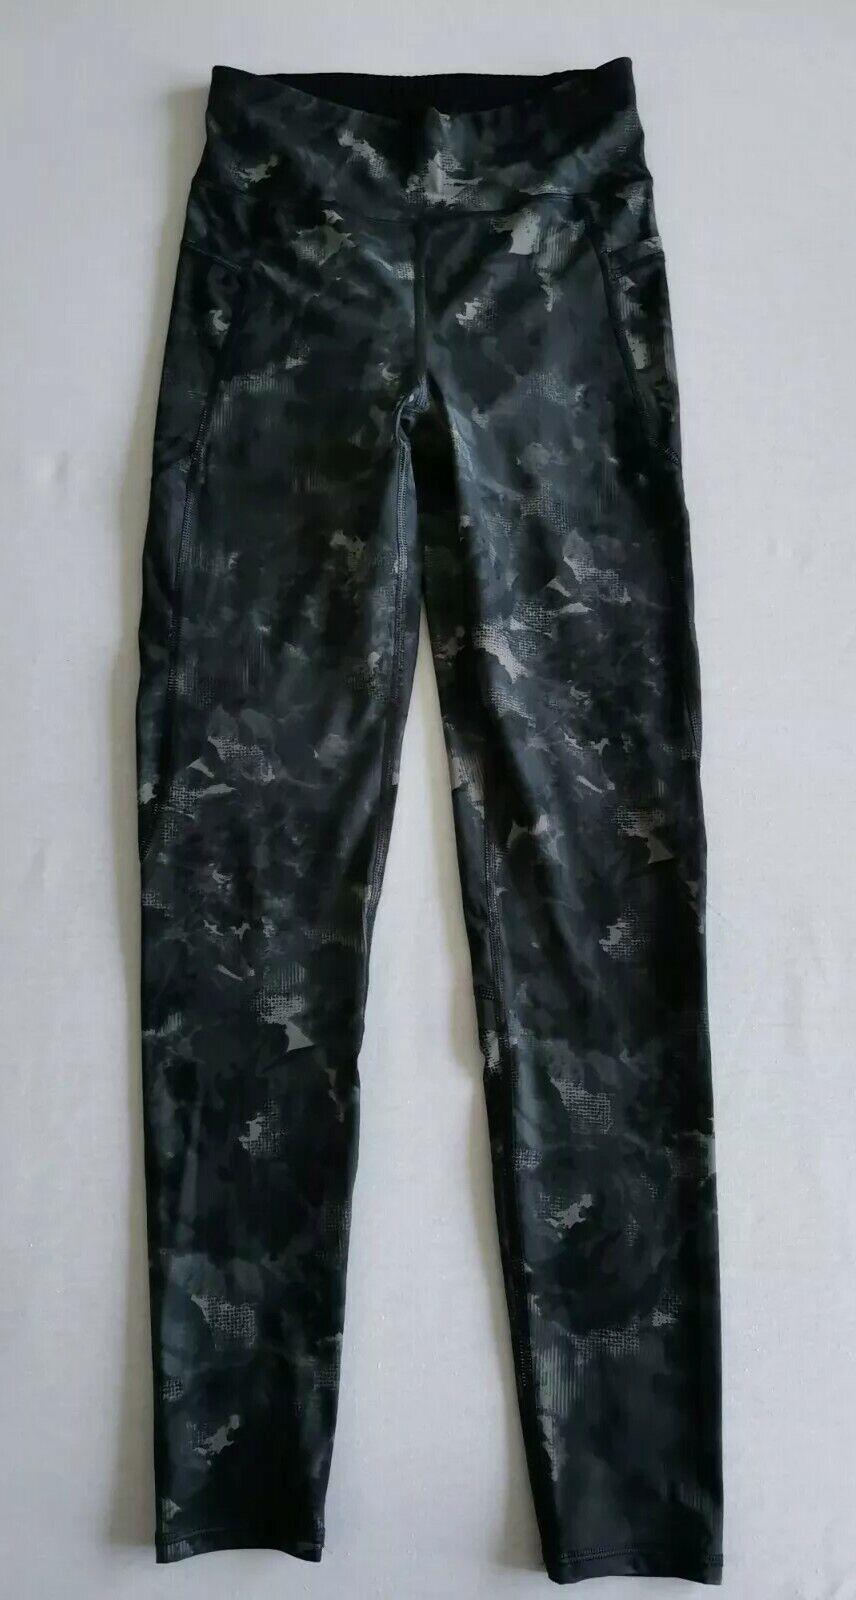 Sweaty Betty Zero Gravity Full Length Leggings - Black Grey Dot Camo Print - XS